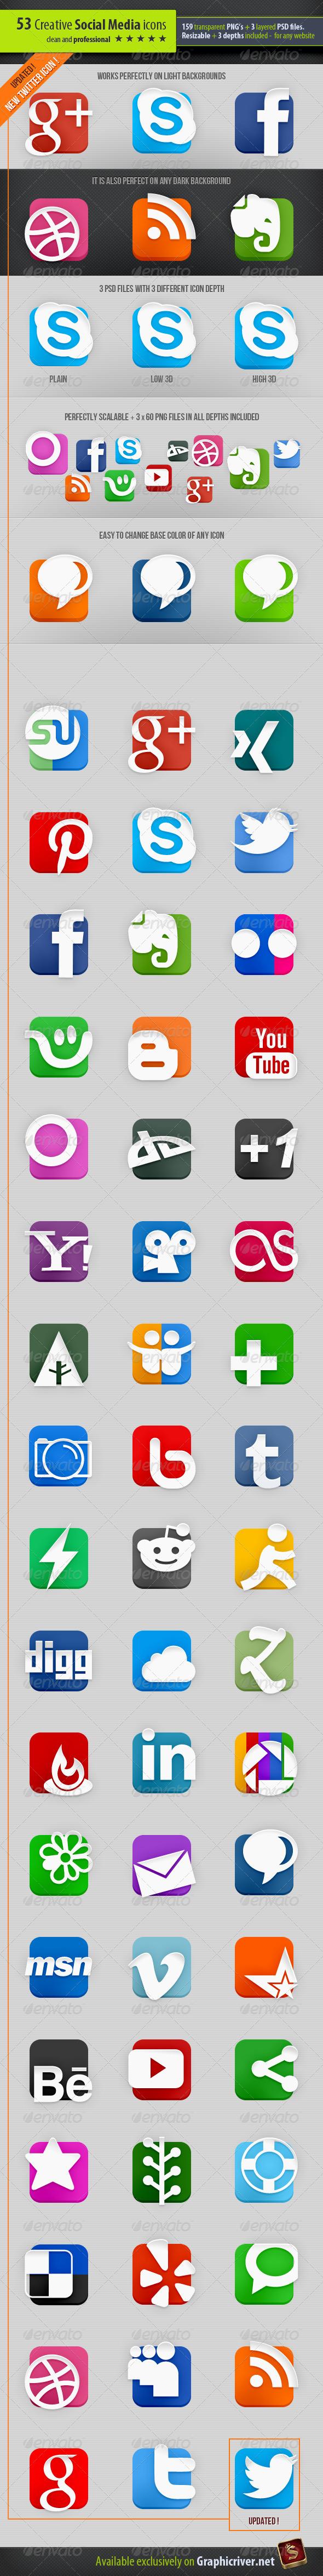 GraphicRiver 53 Creative Social Media Icons 2585079